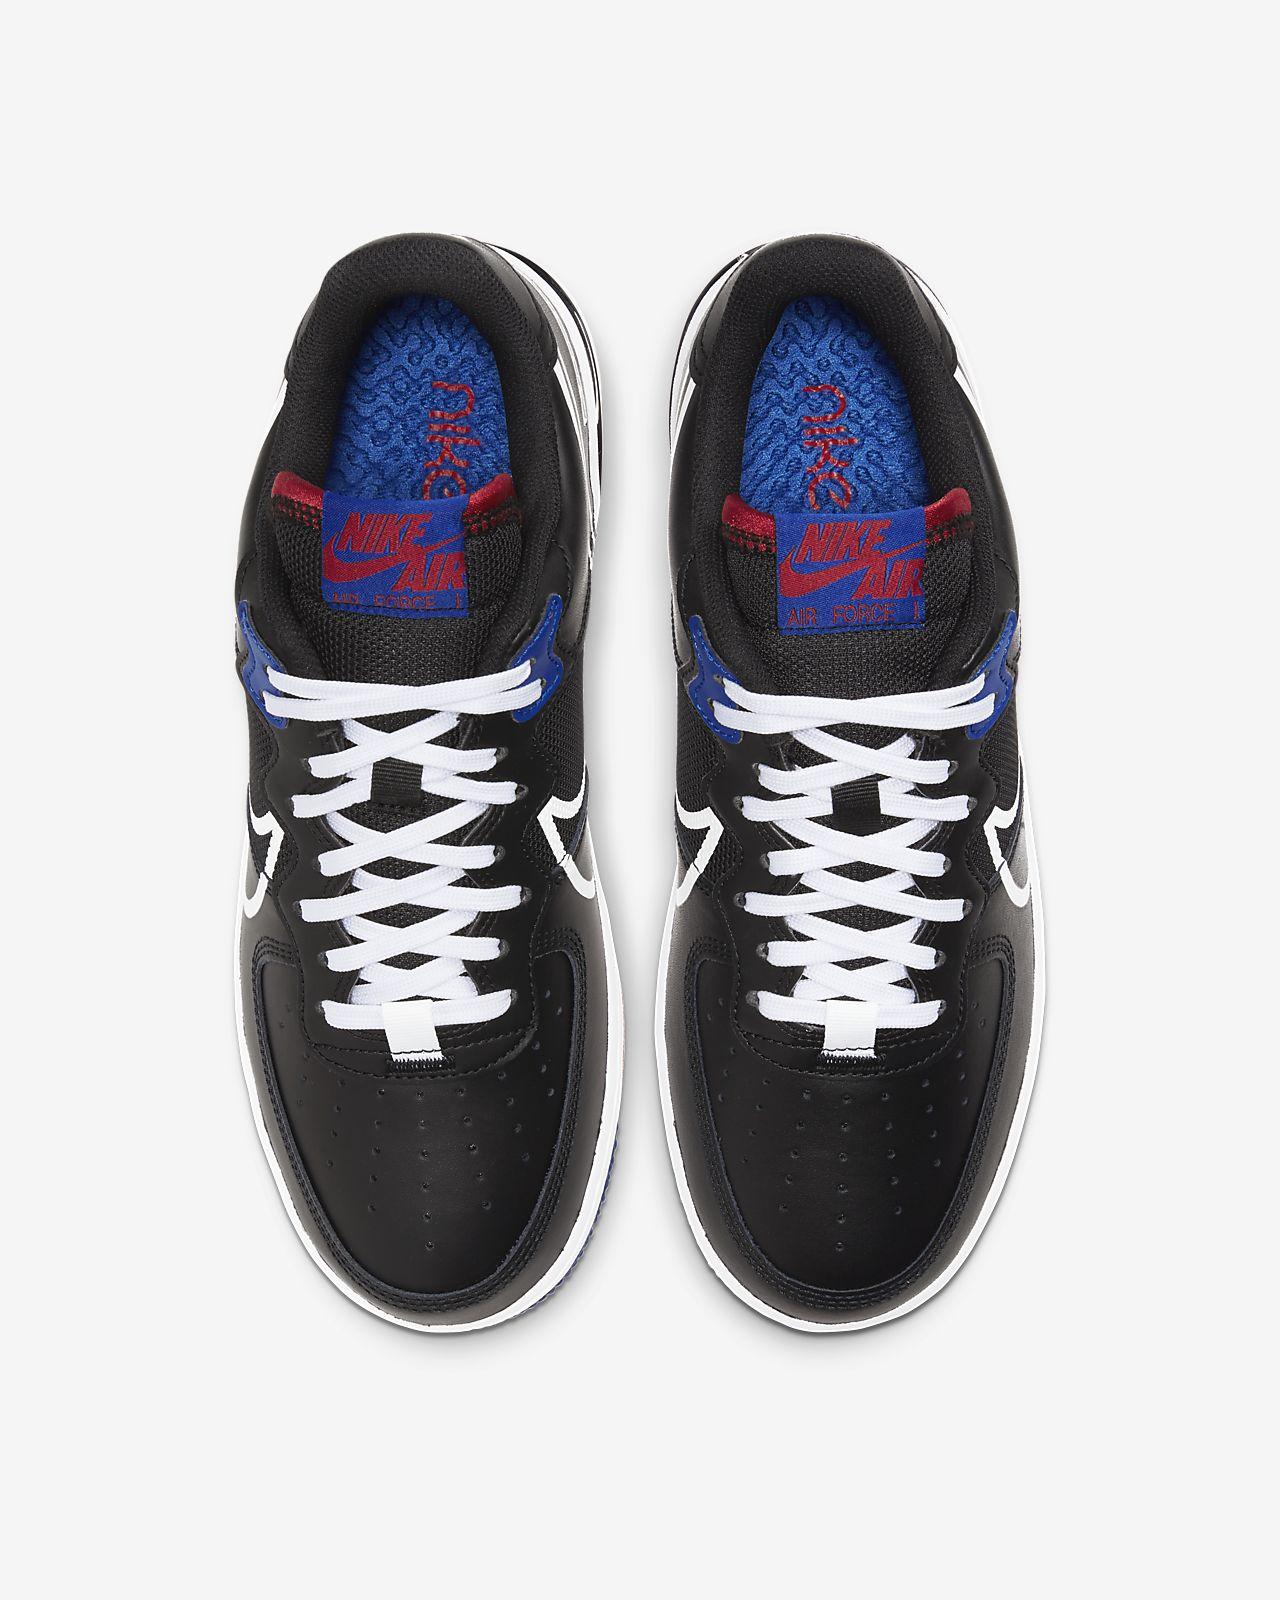 Nike Air Force 1 Low React Black White Gym Red Gym Blue